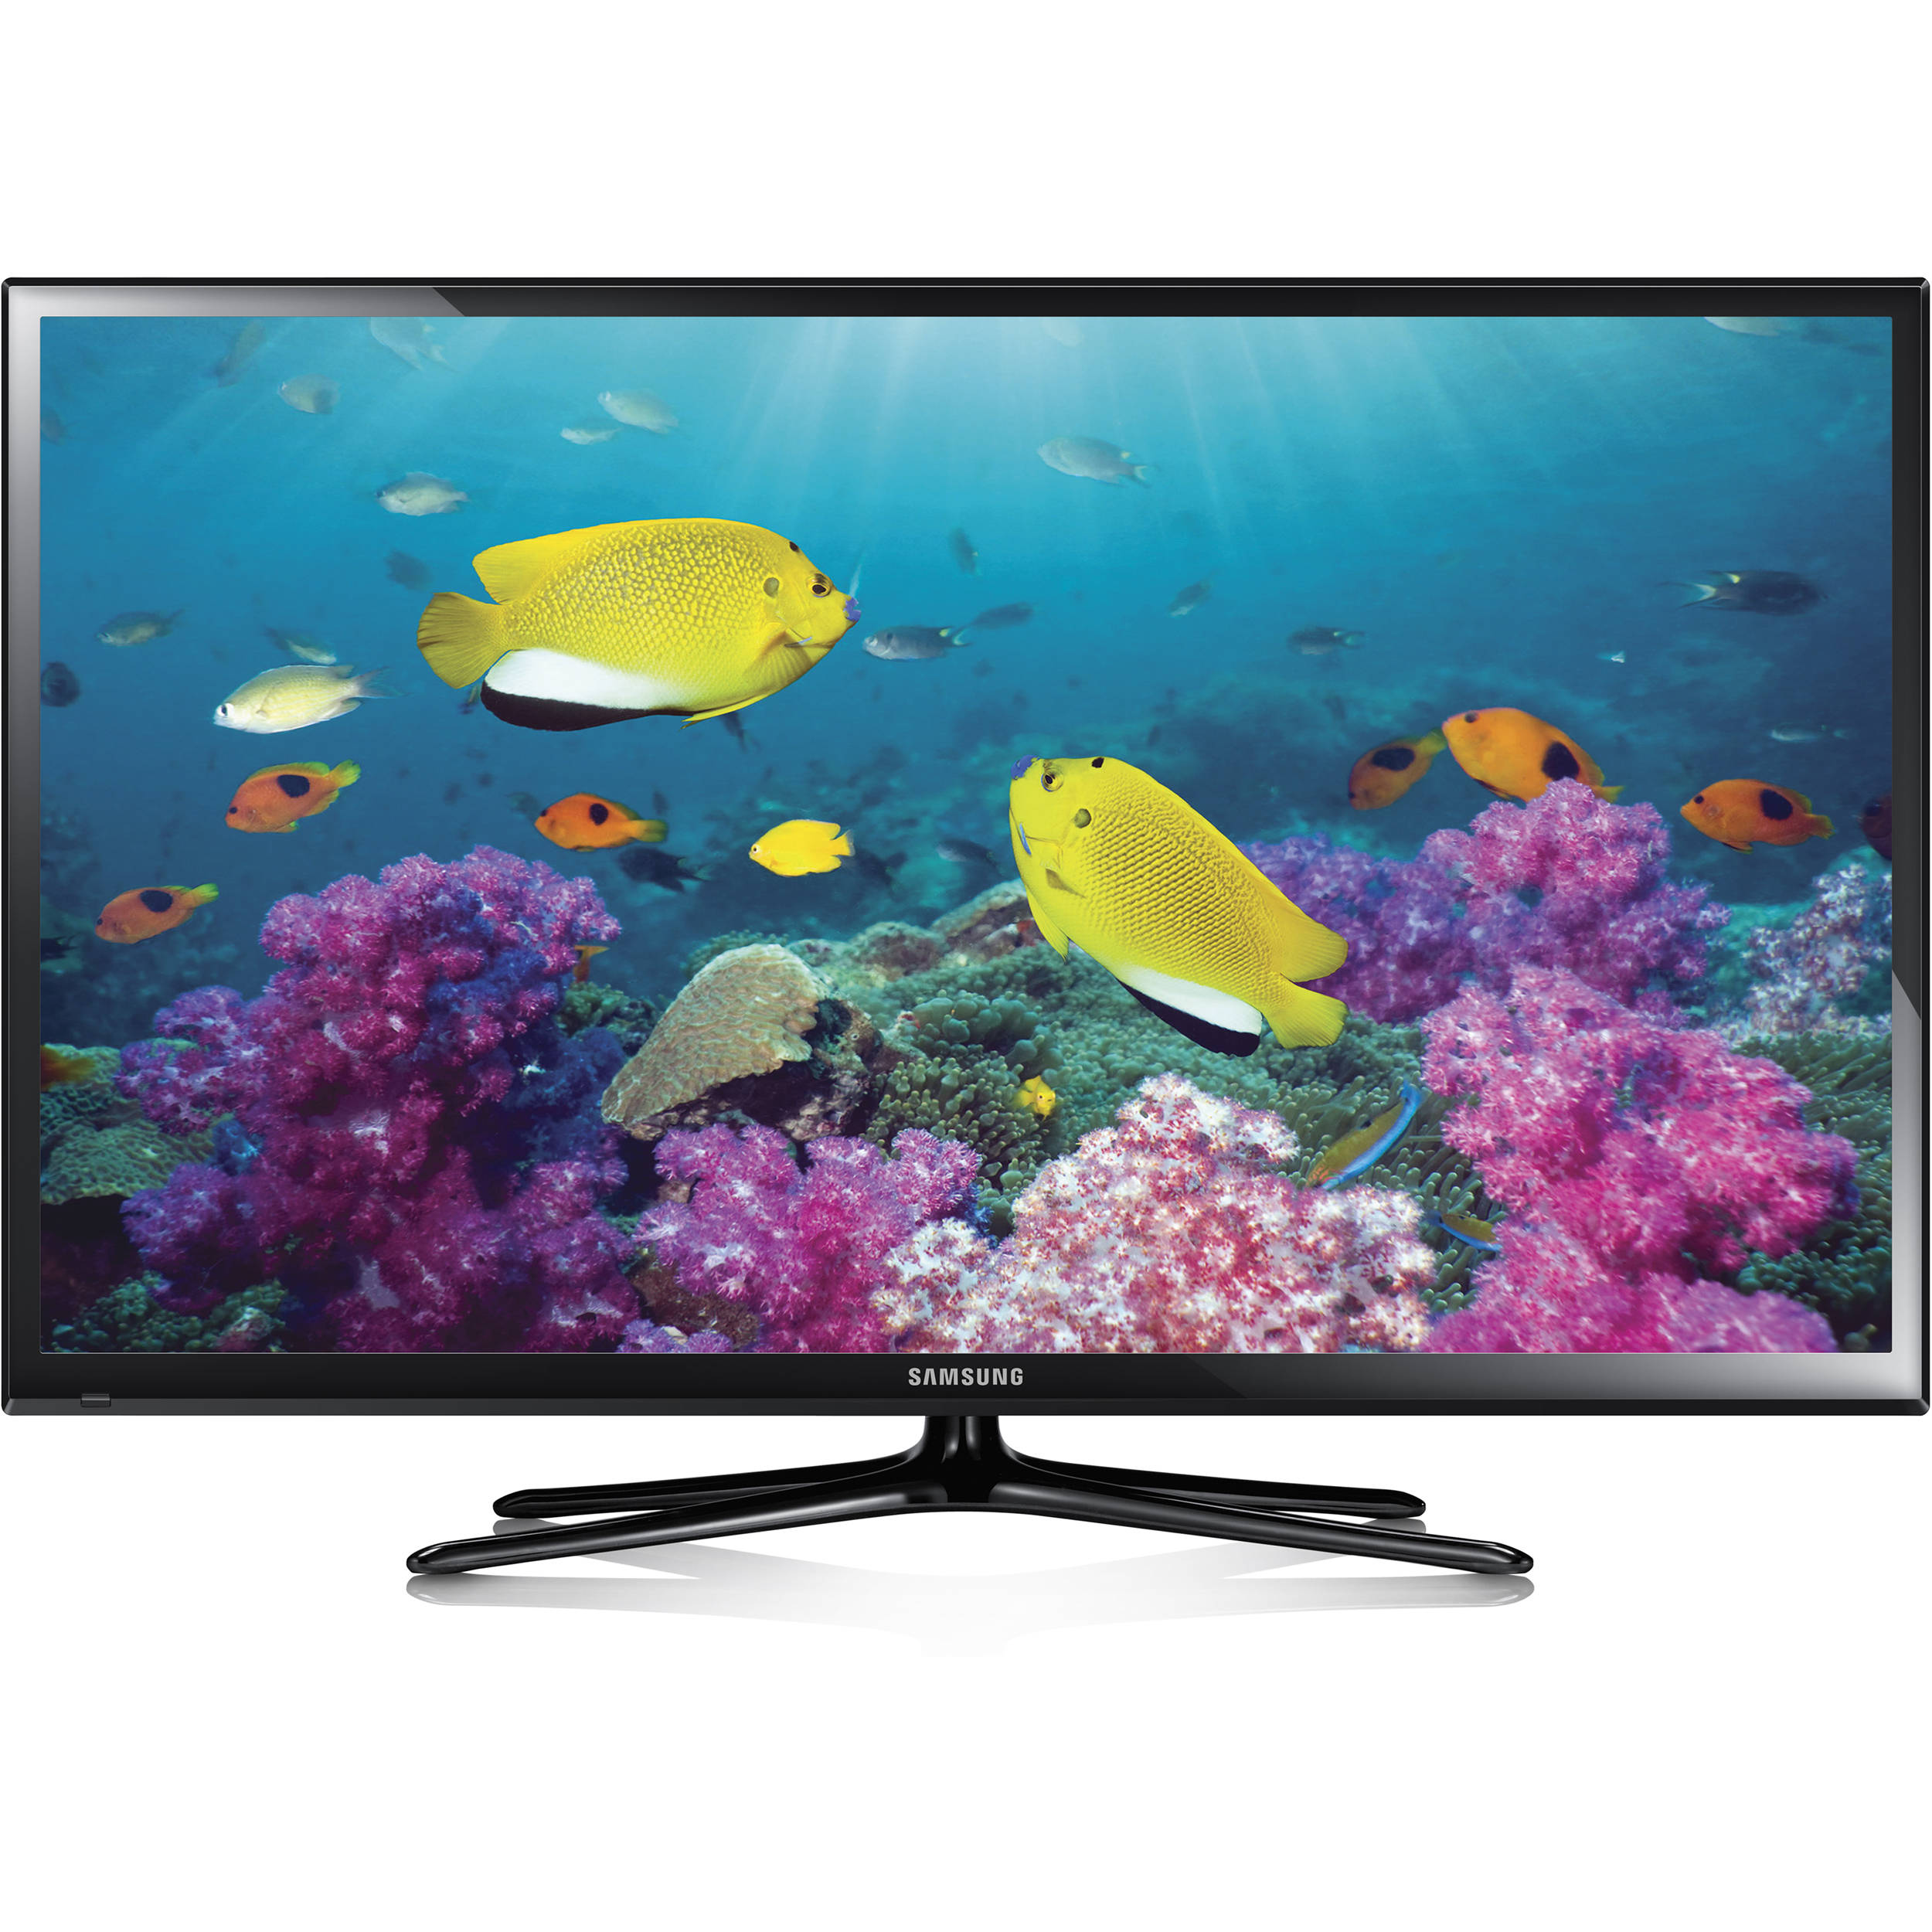 "Samsung 60"" 5300 Series Full HD Plasma TV PN60F5300BFXZA for Samsung Plasma Tv 60 Inch  59nar"